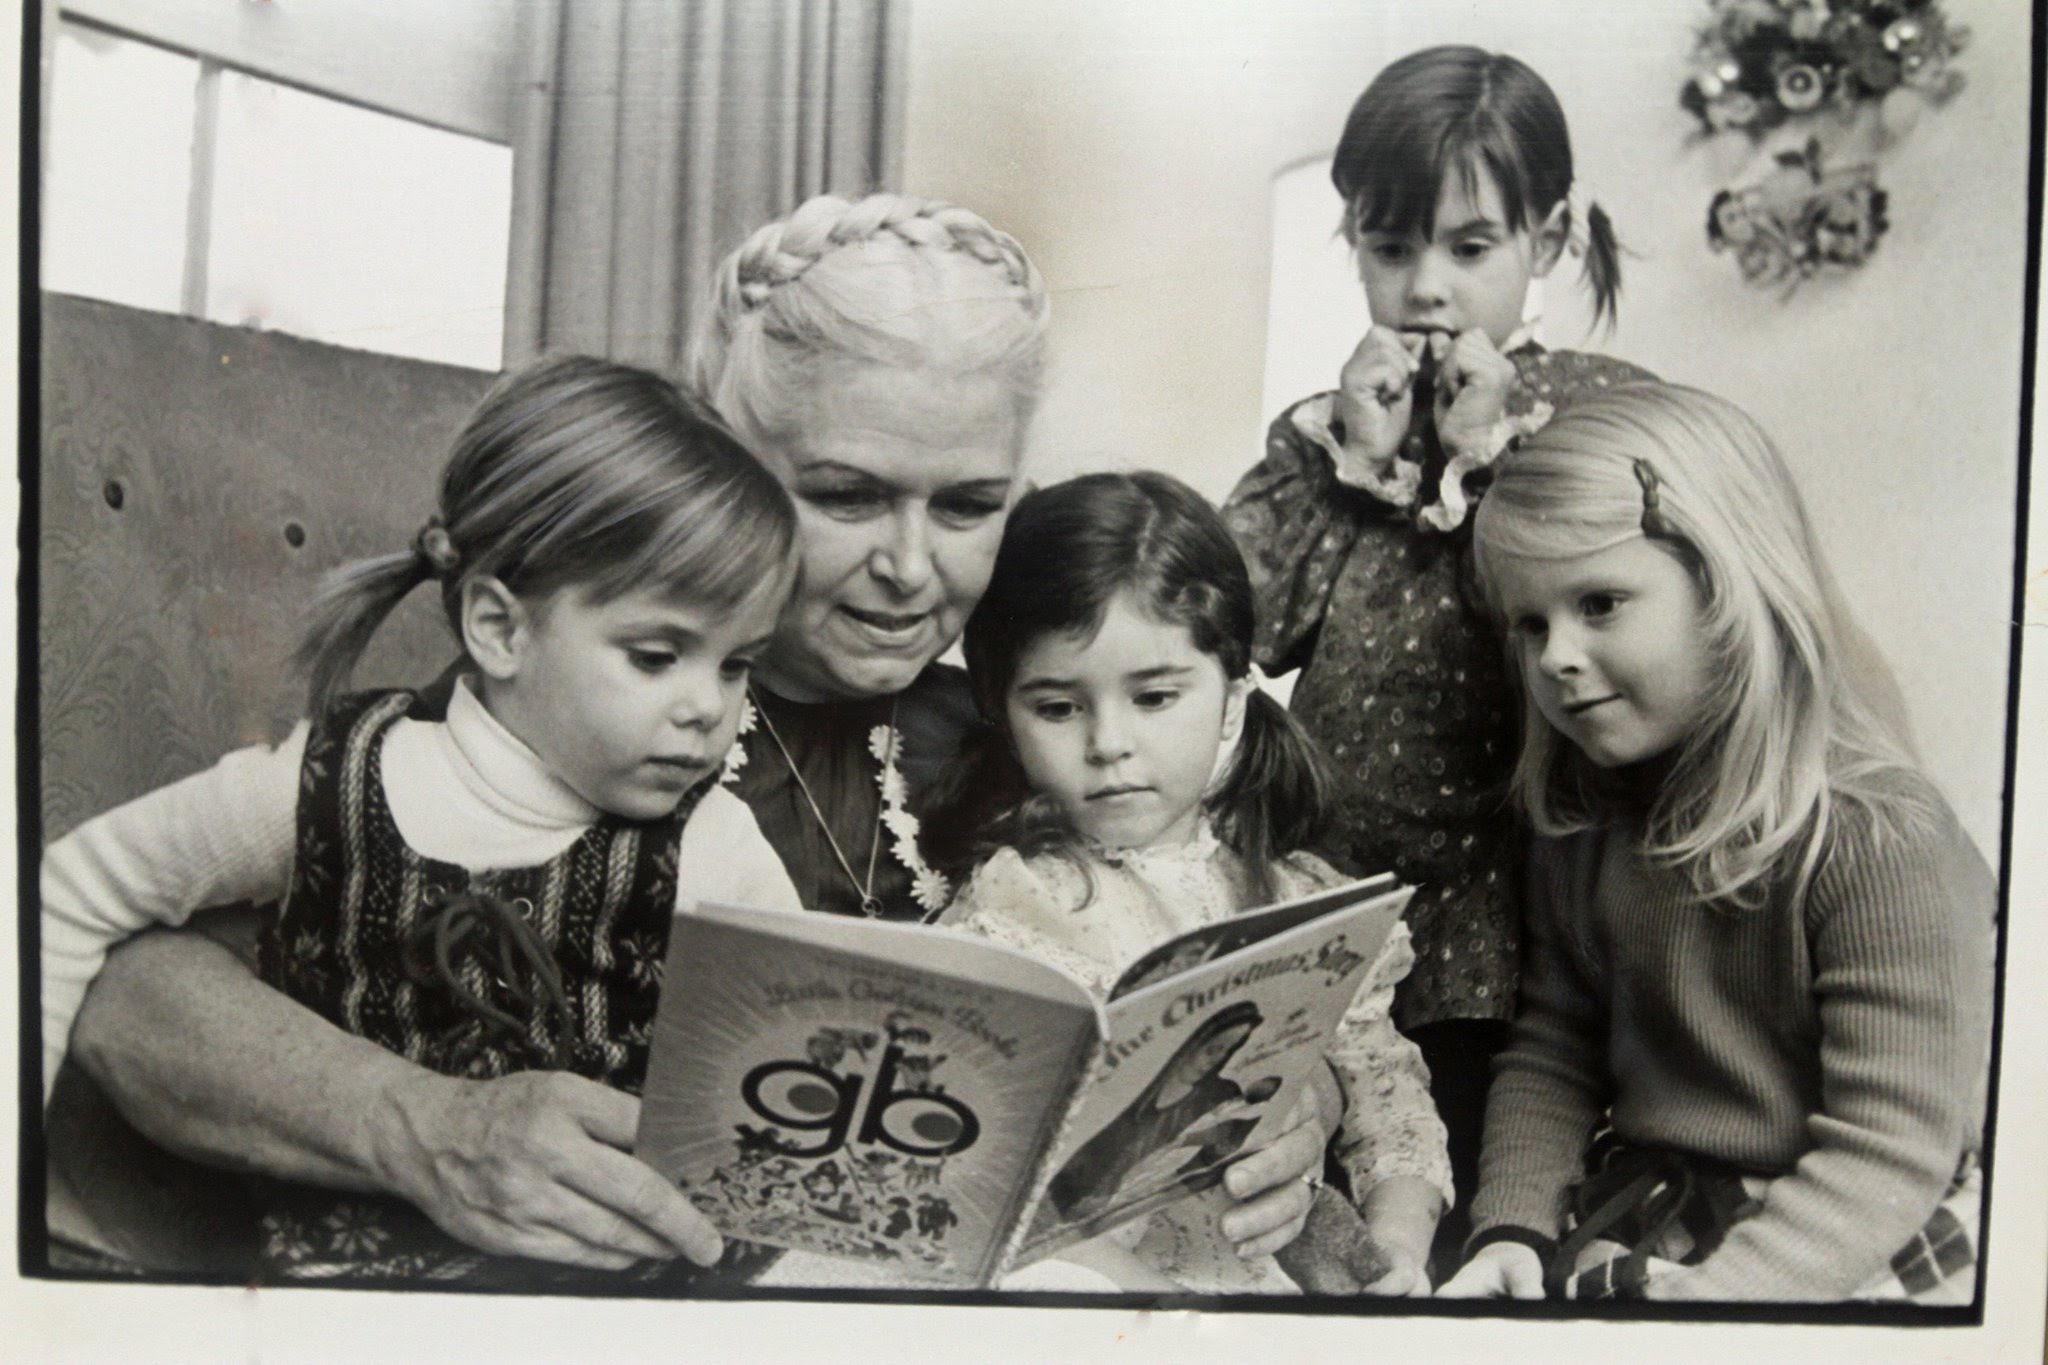 Mum reads to grandchildren on TV Christmas Special